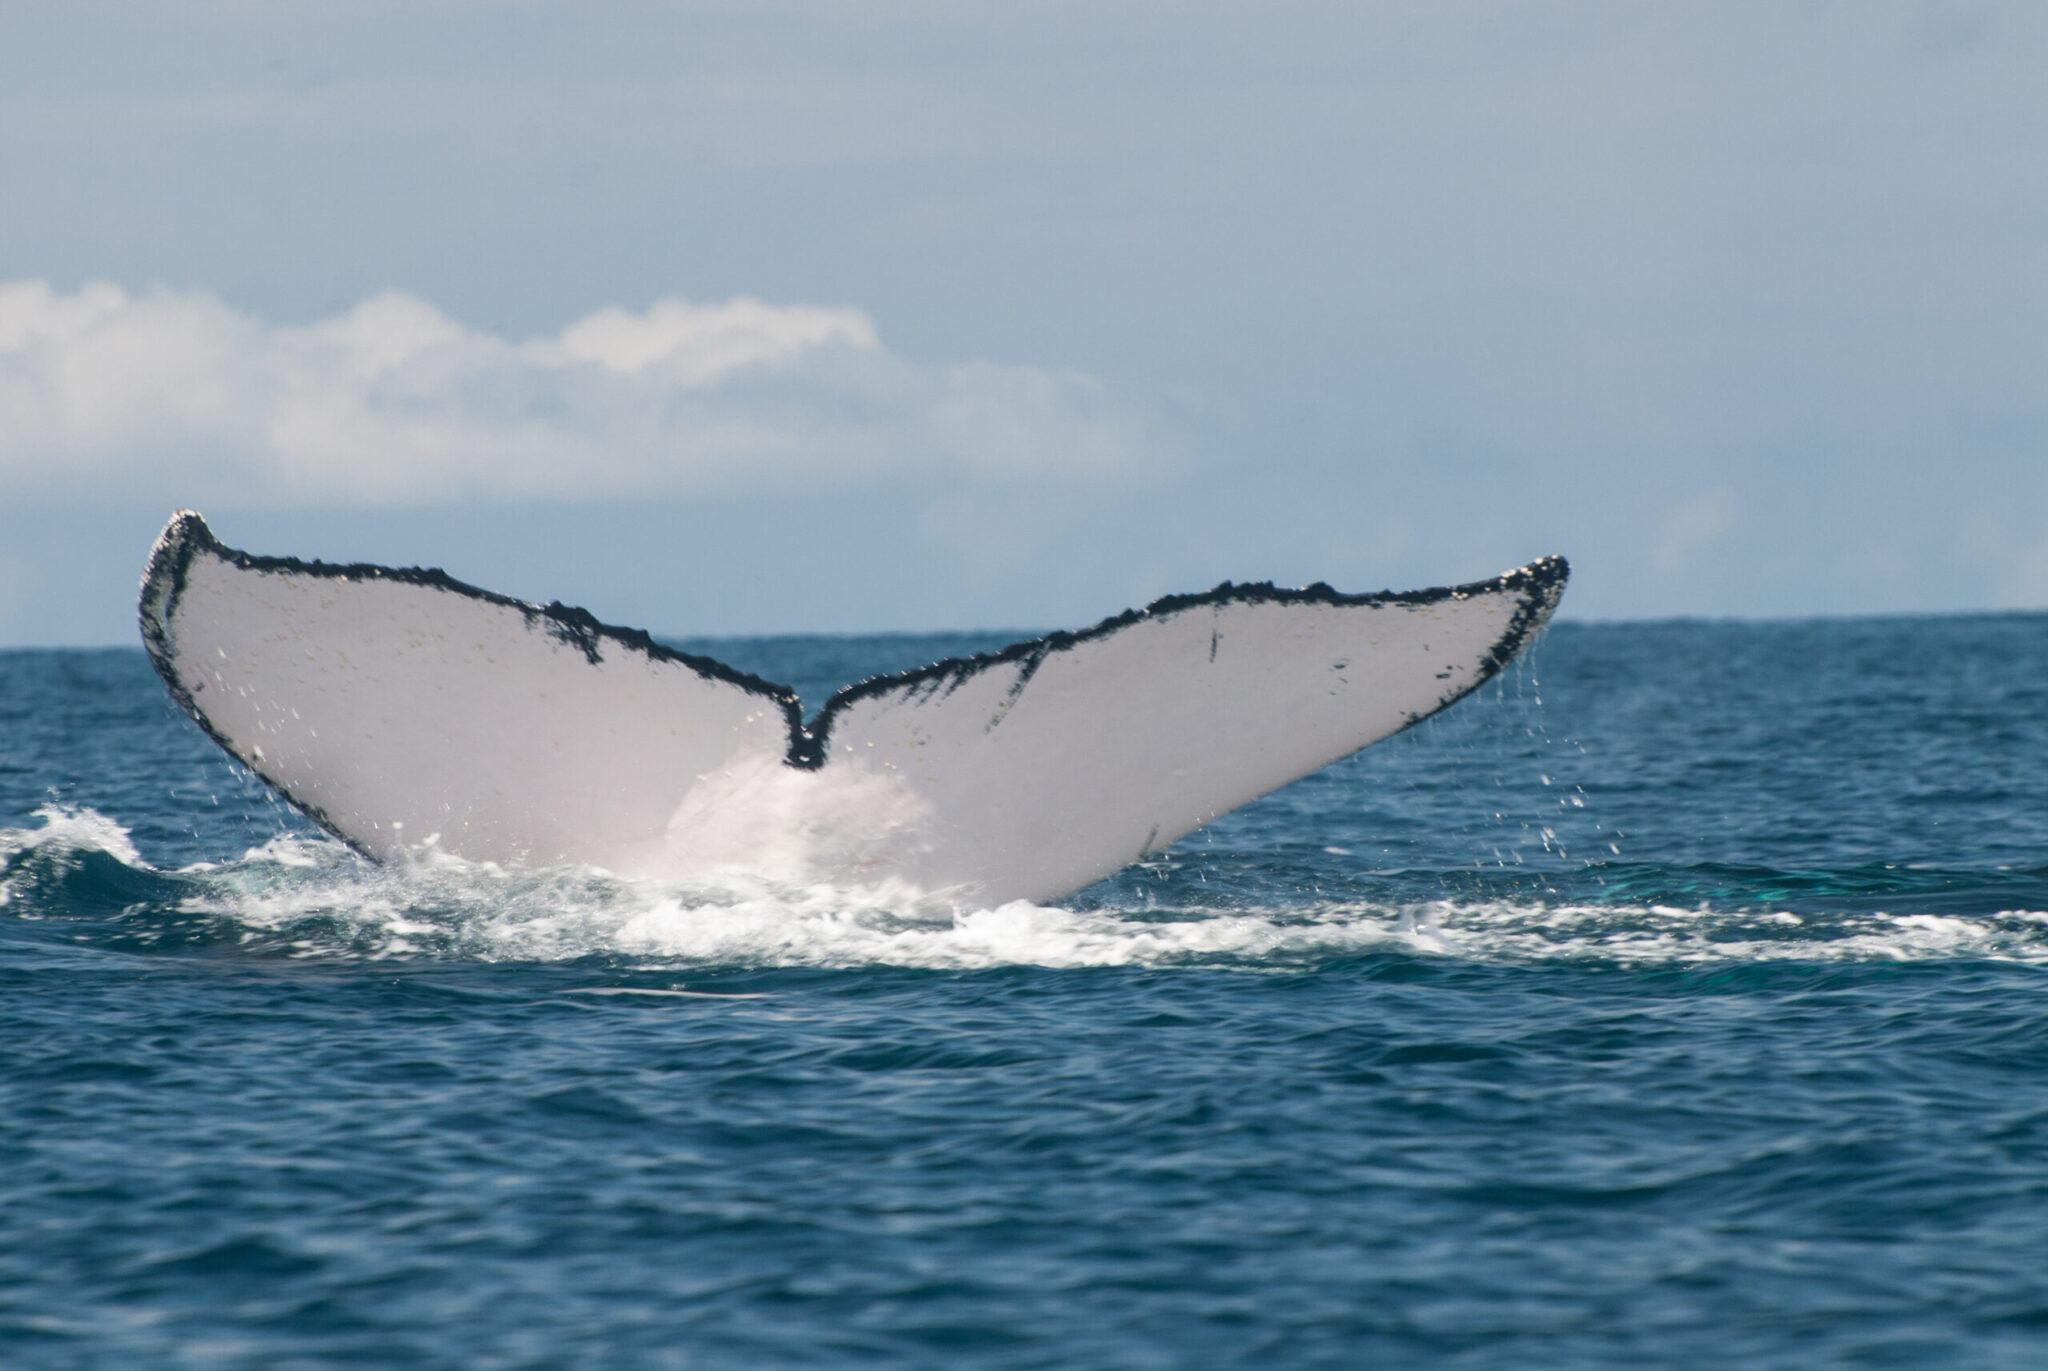 Panama whales